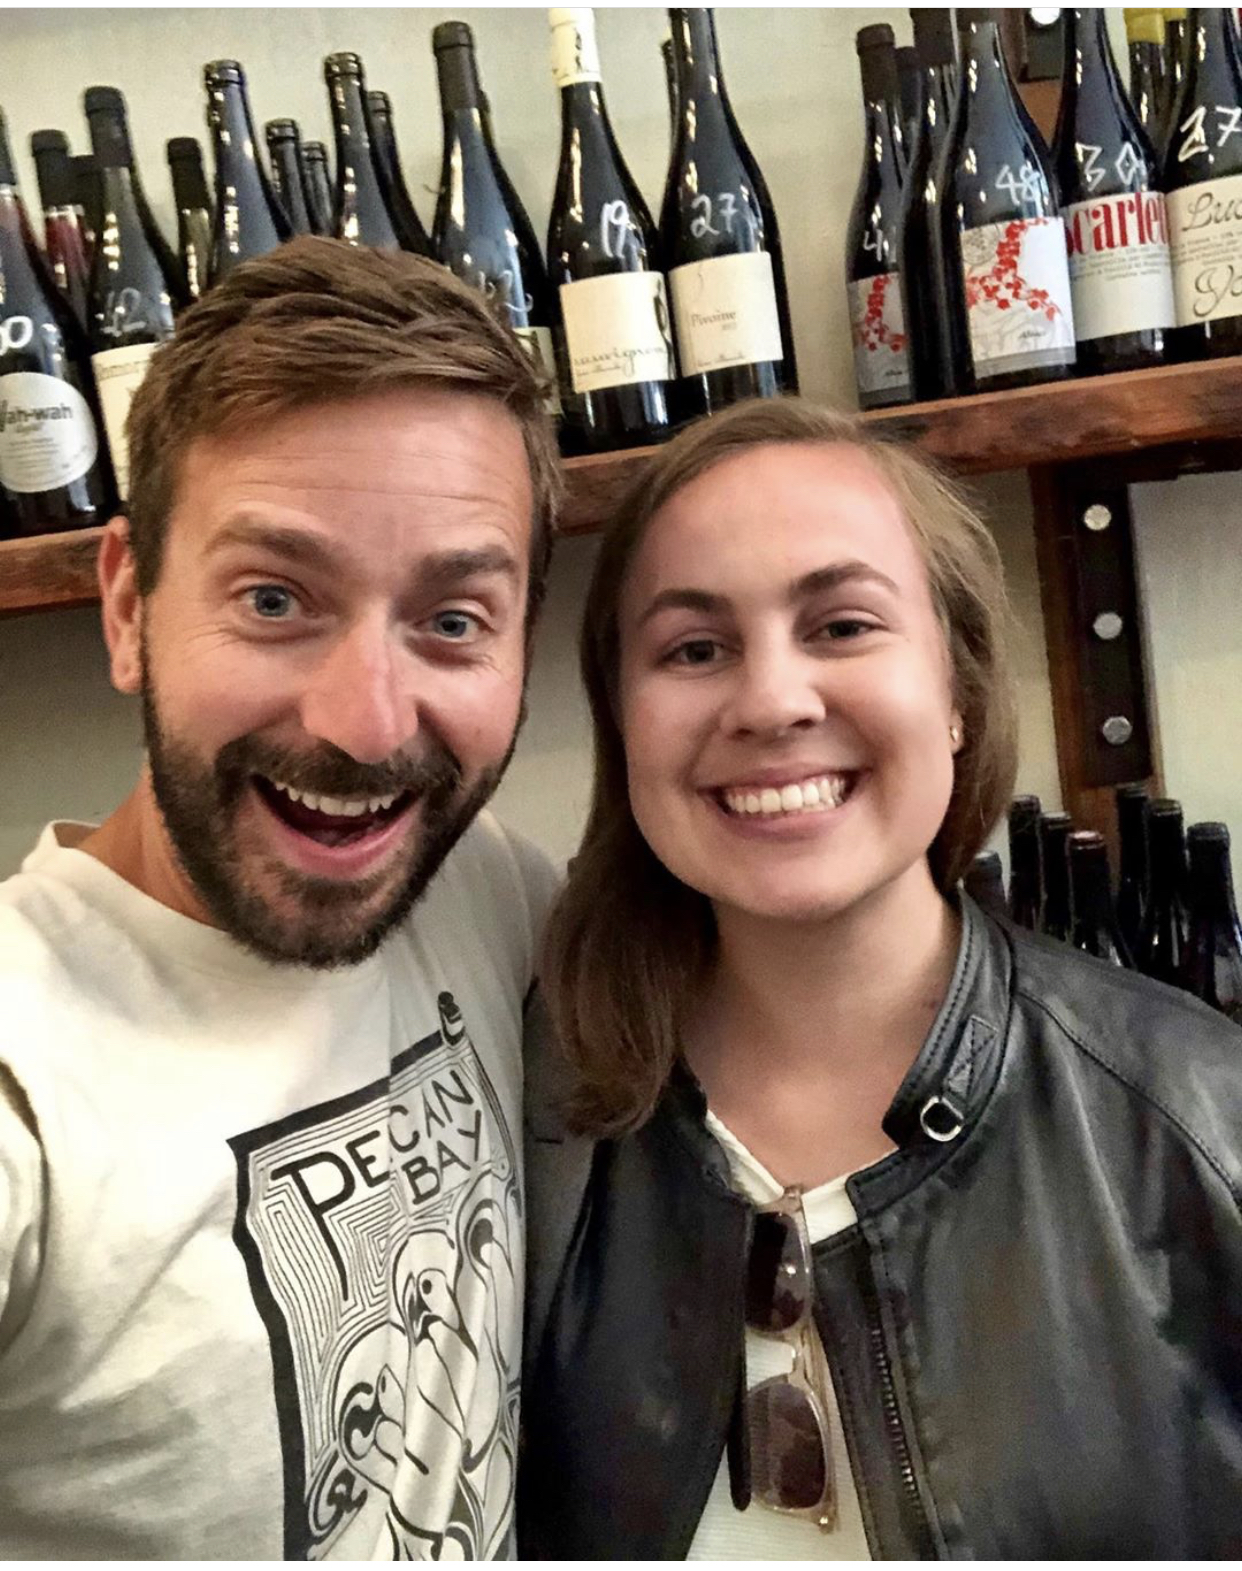 OMG! It's Claire with Evan Lewandowski!